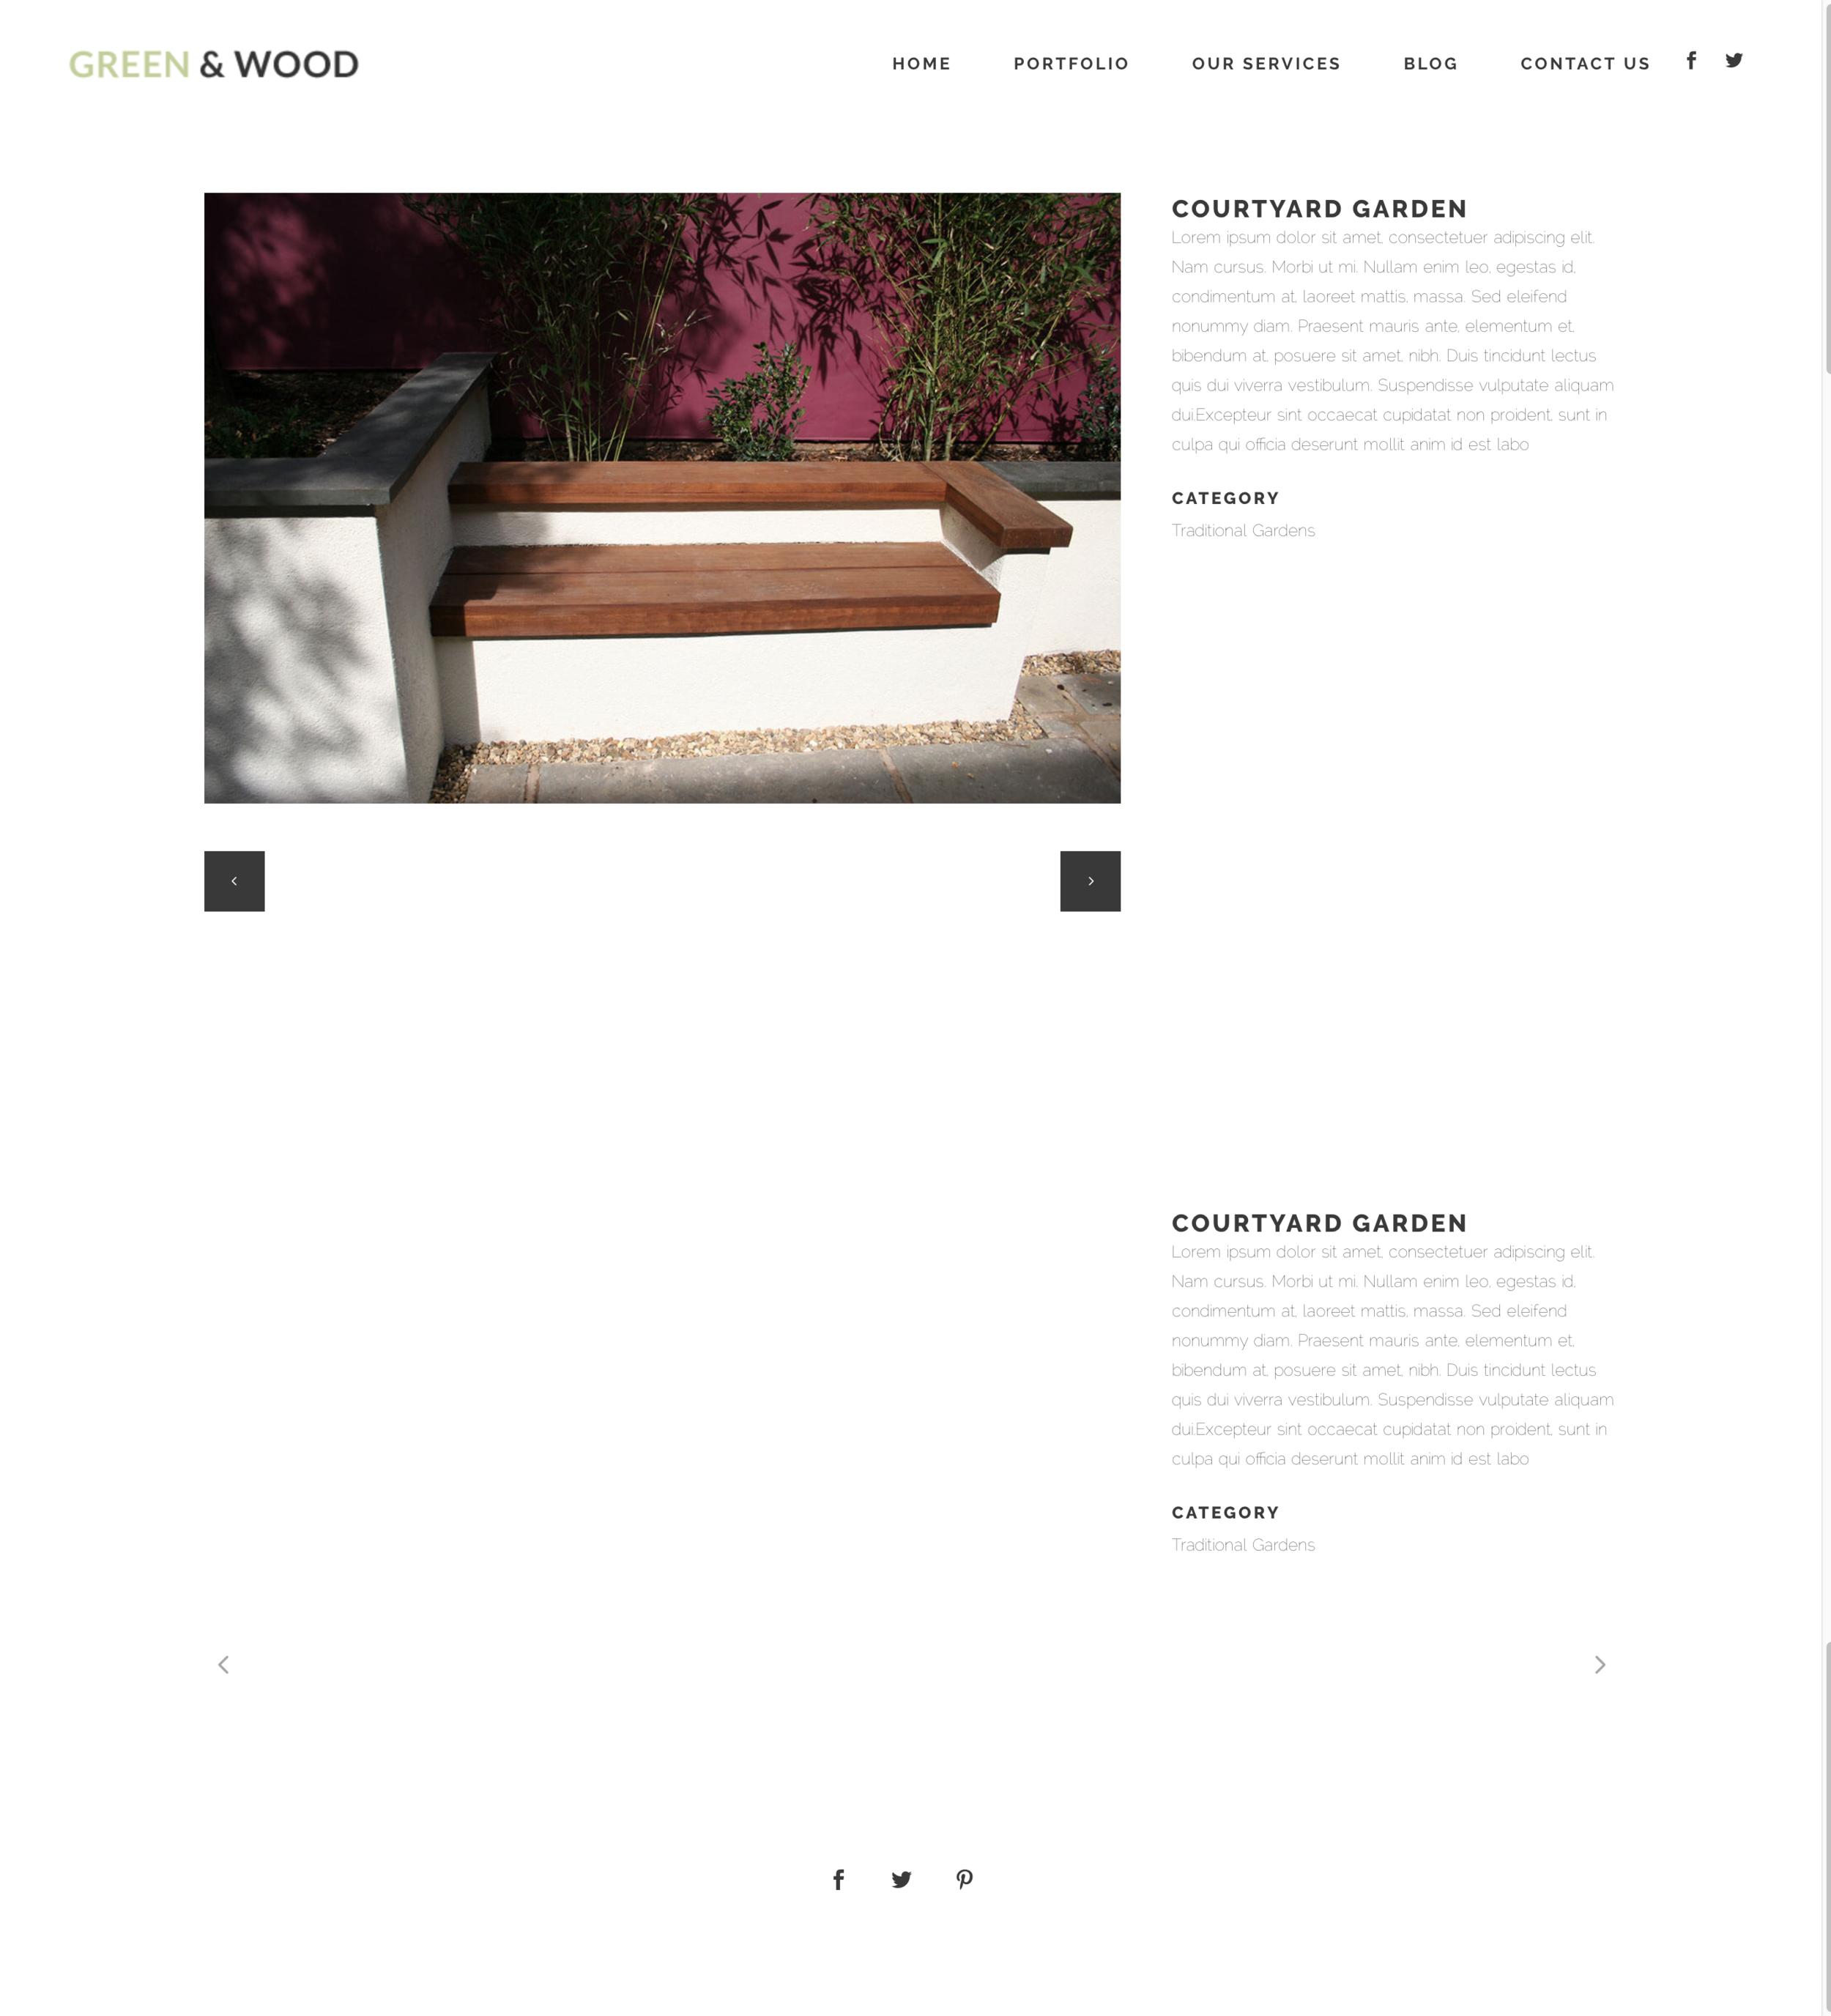 greenandwood-portfolio-garden.png